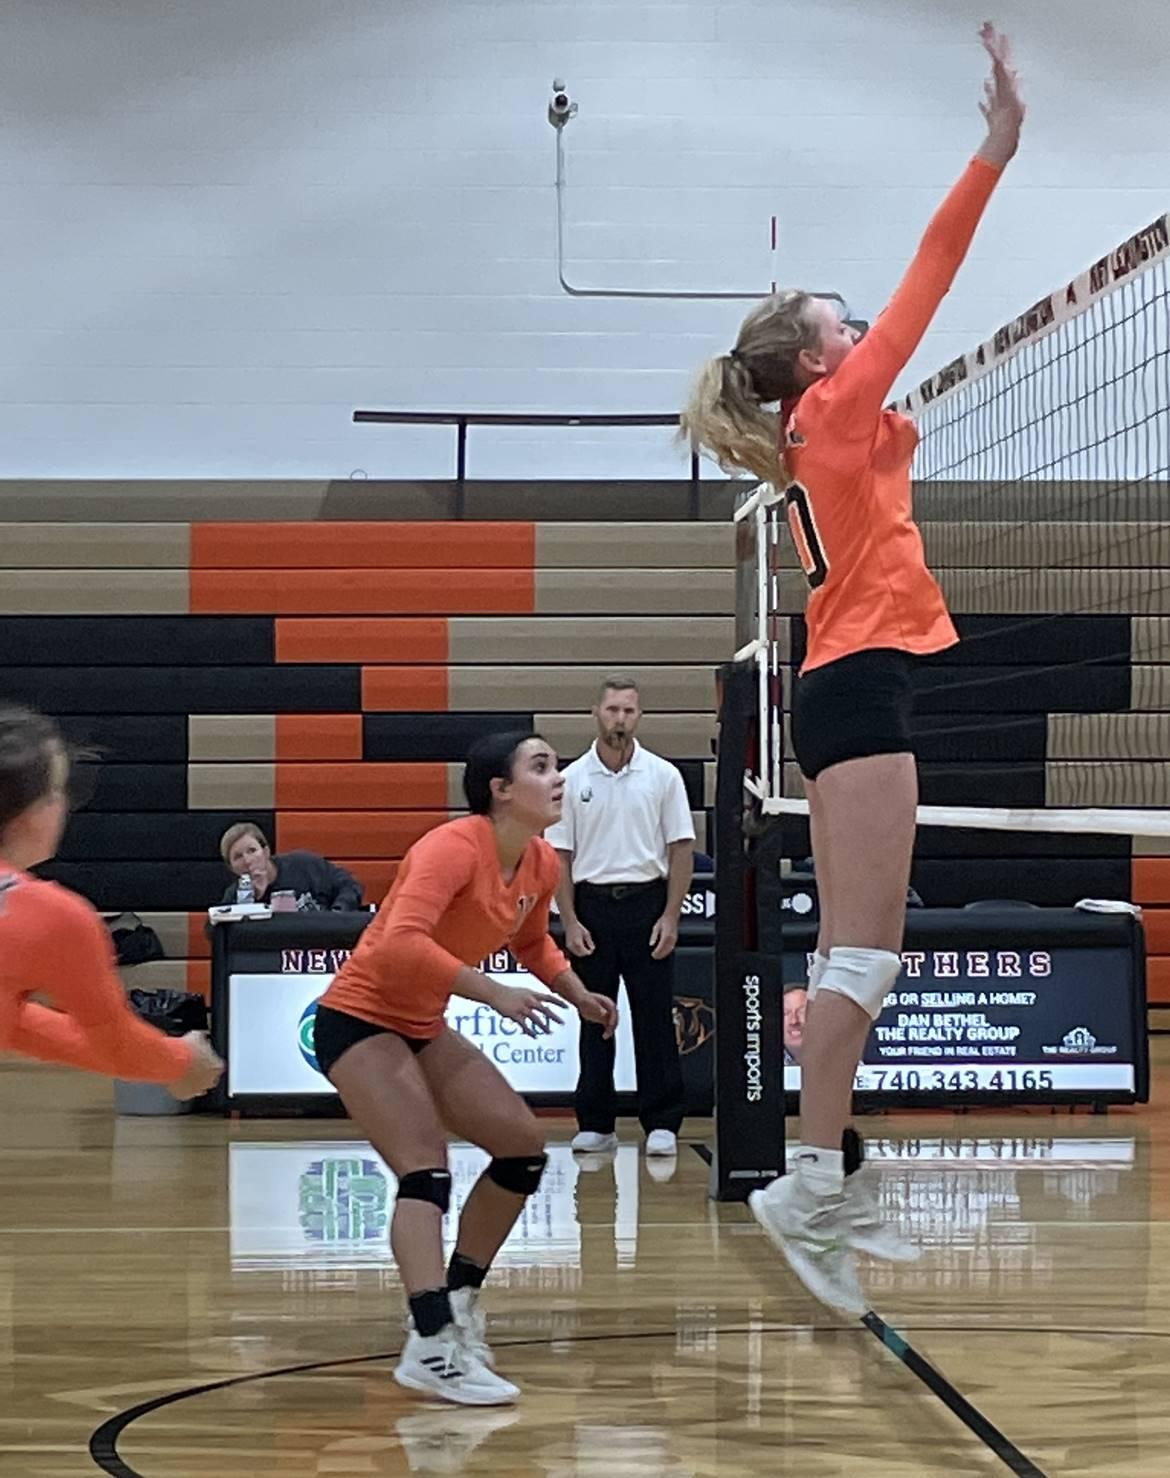 Varsity Volleyball taking on Fort Frye